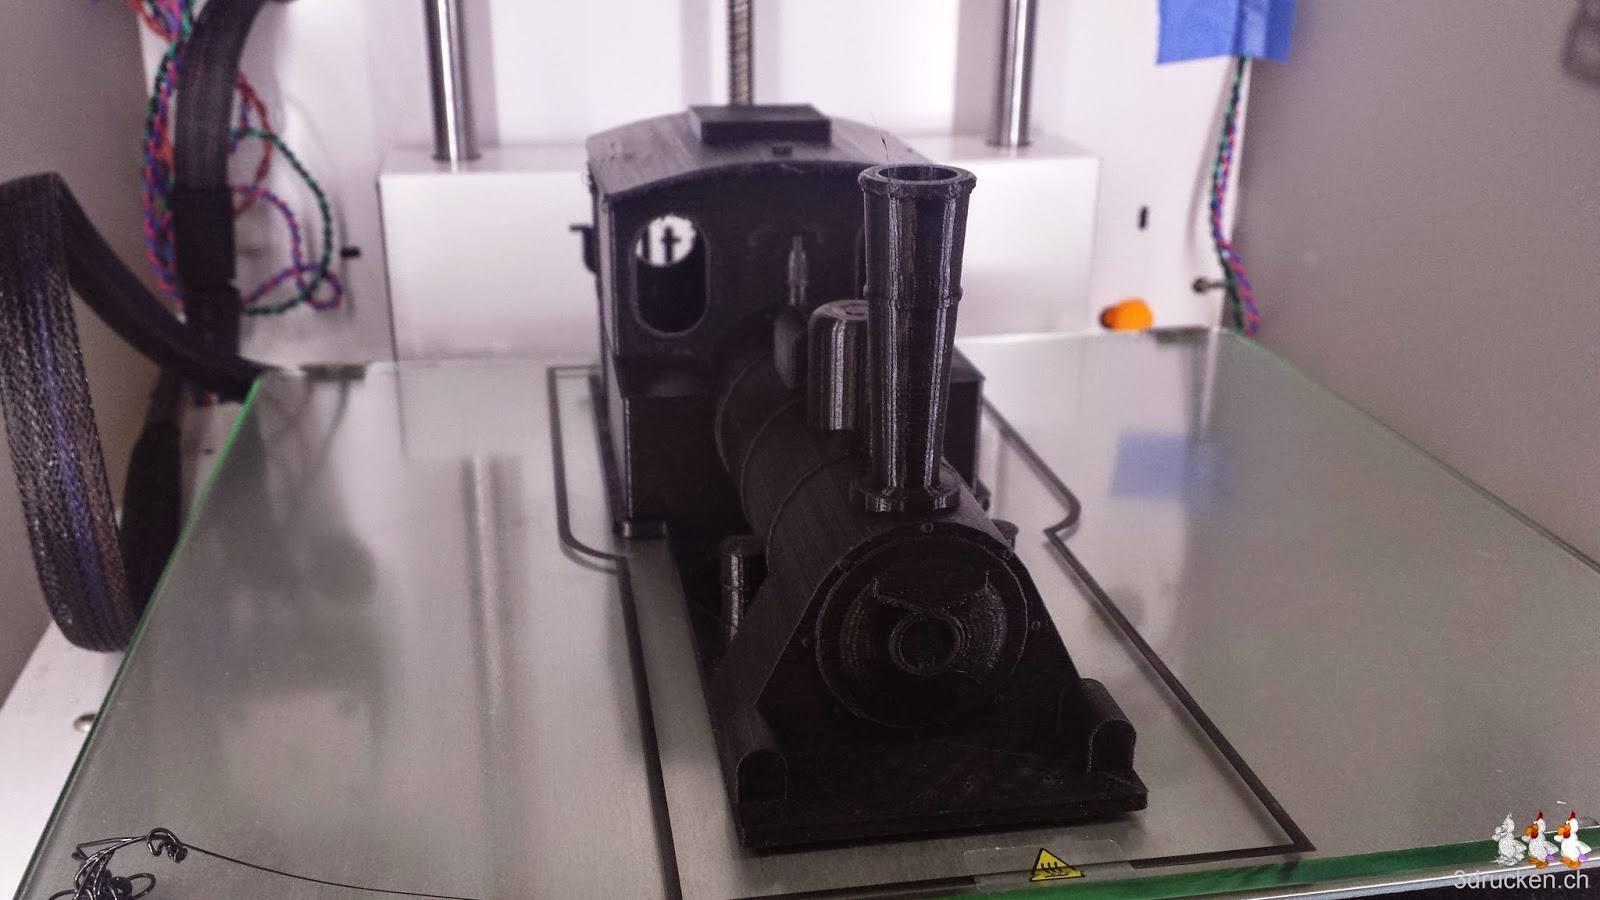 Foto der definitiven Version des Hauptkörpers der Lokomotive inklusive Dach auf dem Ultimaker 2 aus schwarzem PLA/PHA gedruckt